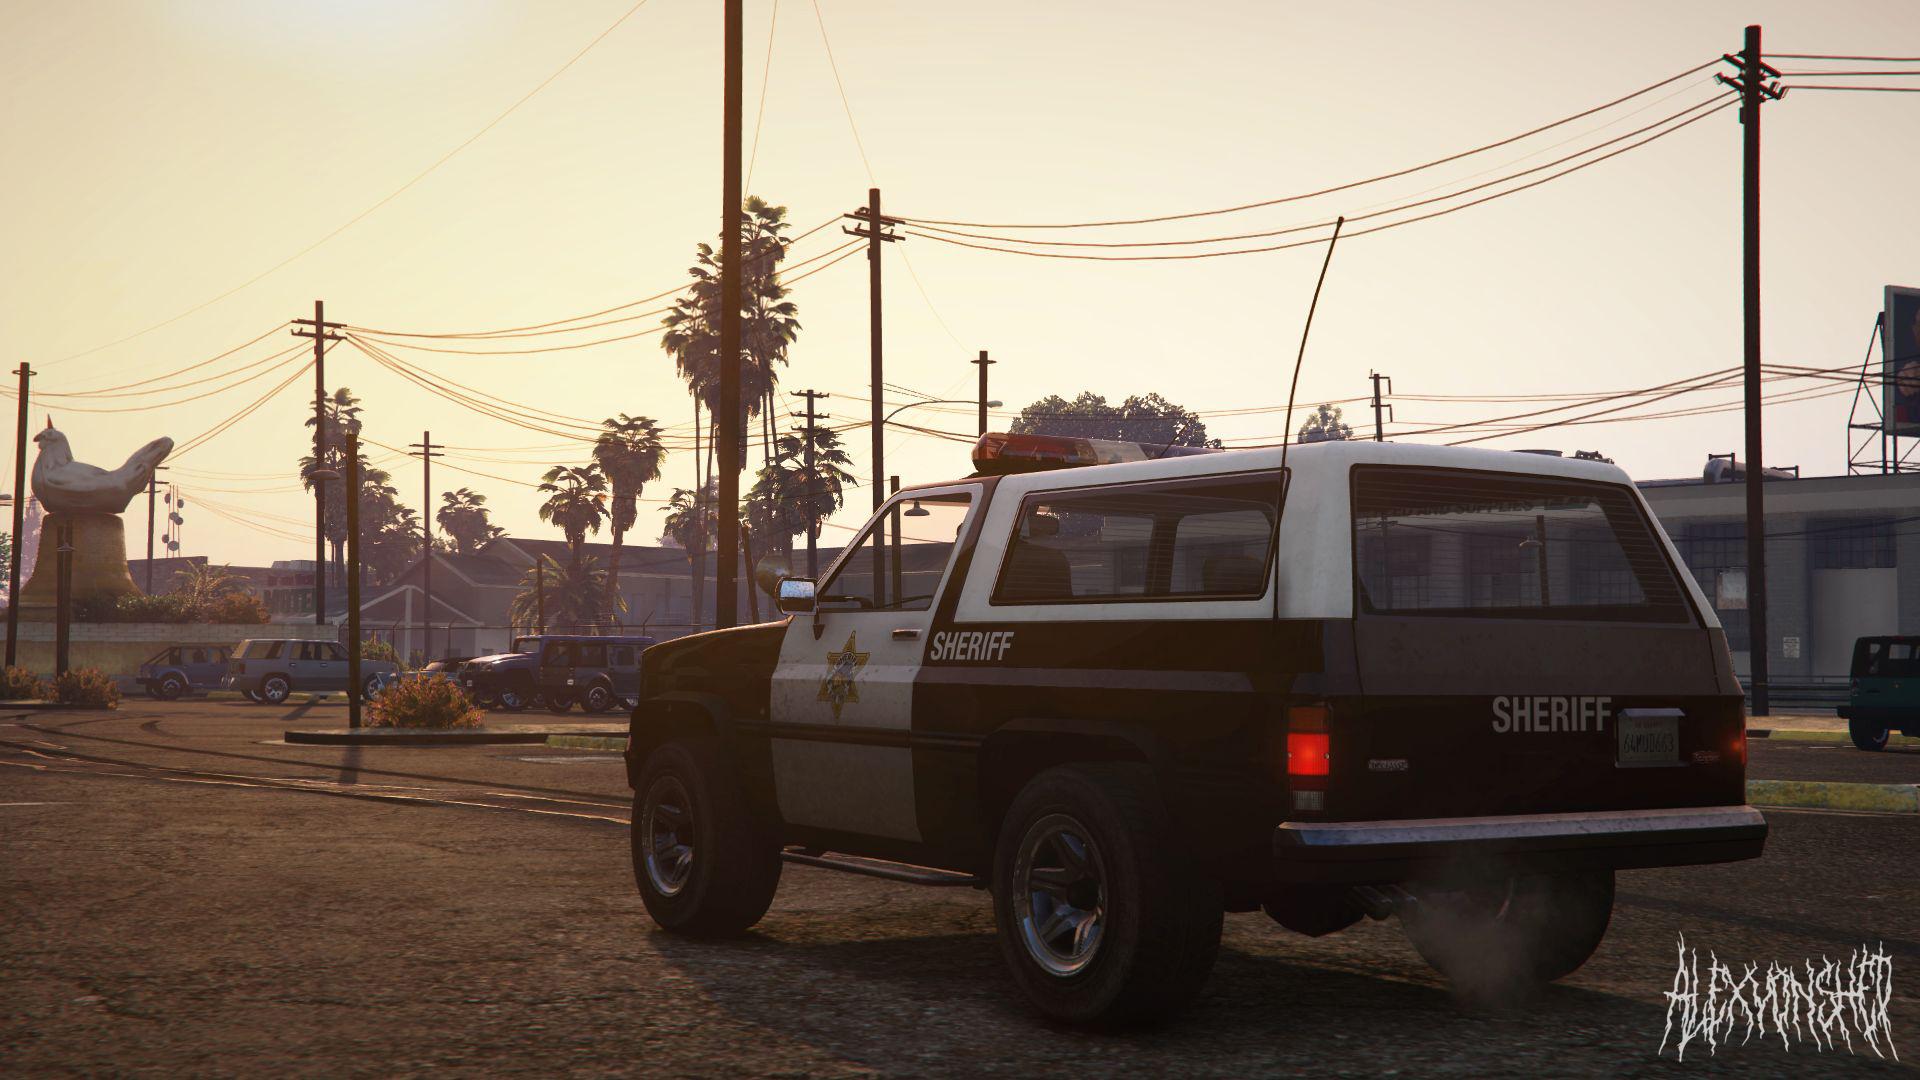 Retro Blaine County Sheriff [Rural Style] - GTA5-Mods com